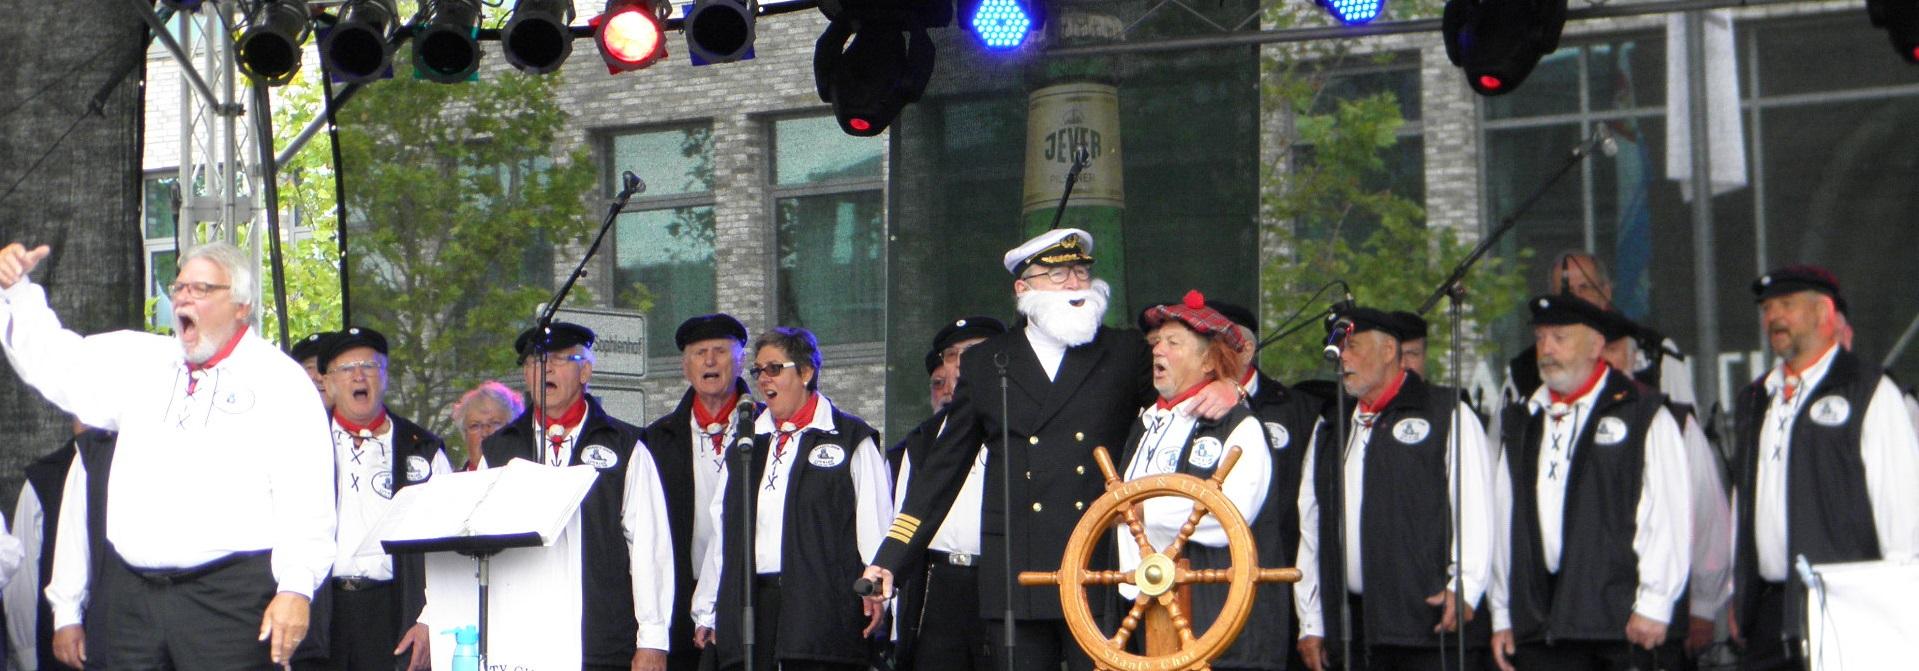 Gudrun Dobbertin  ShantyChor LUV  LEE Kiel eV von 1989